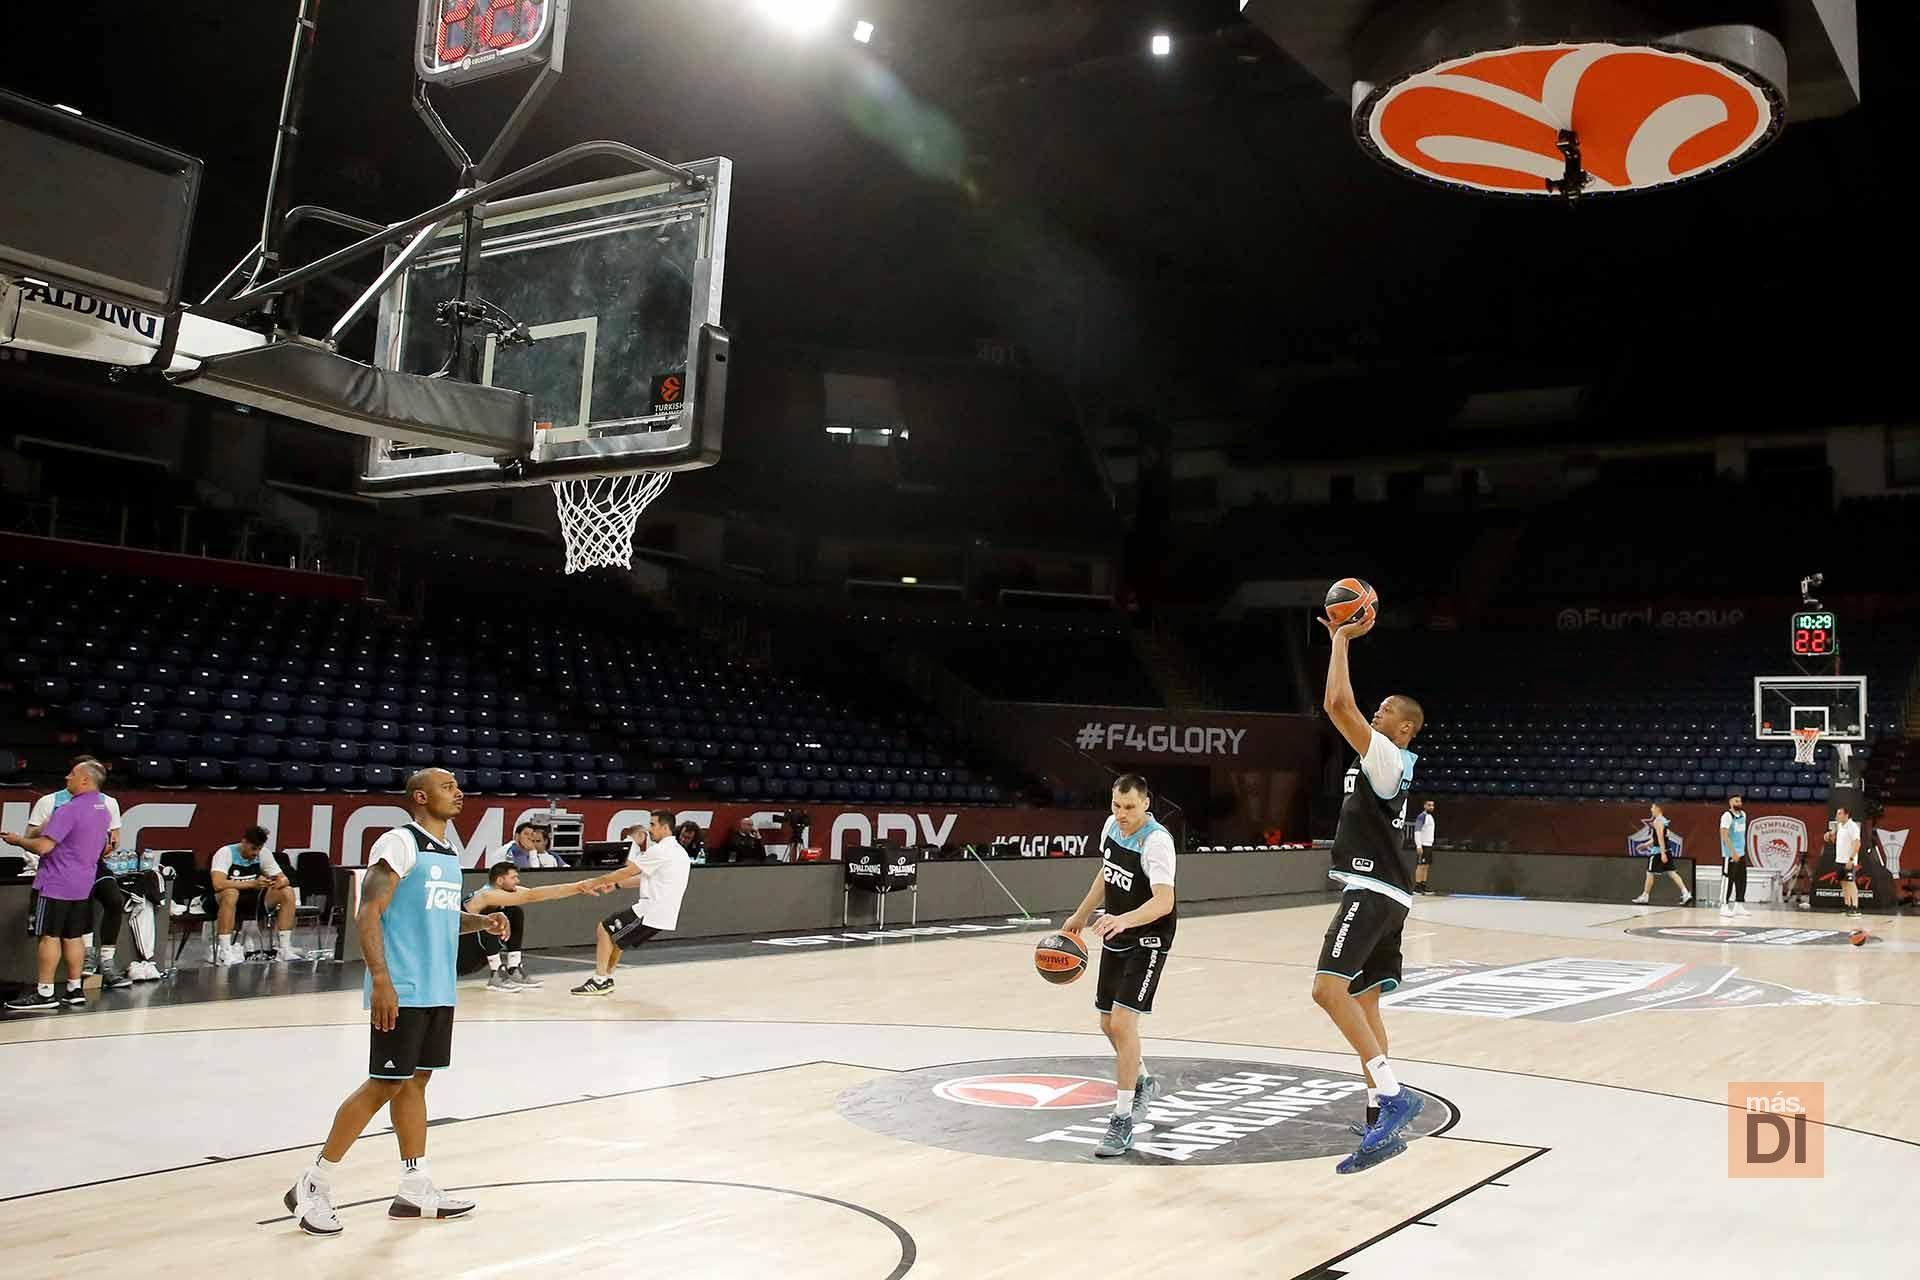 Endesa patrocinará la Euroliga de Baloncesto durante tres temporadas